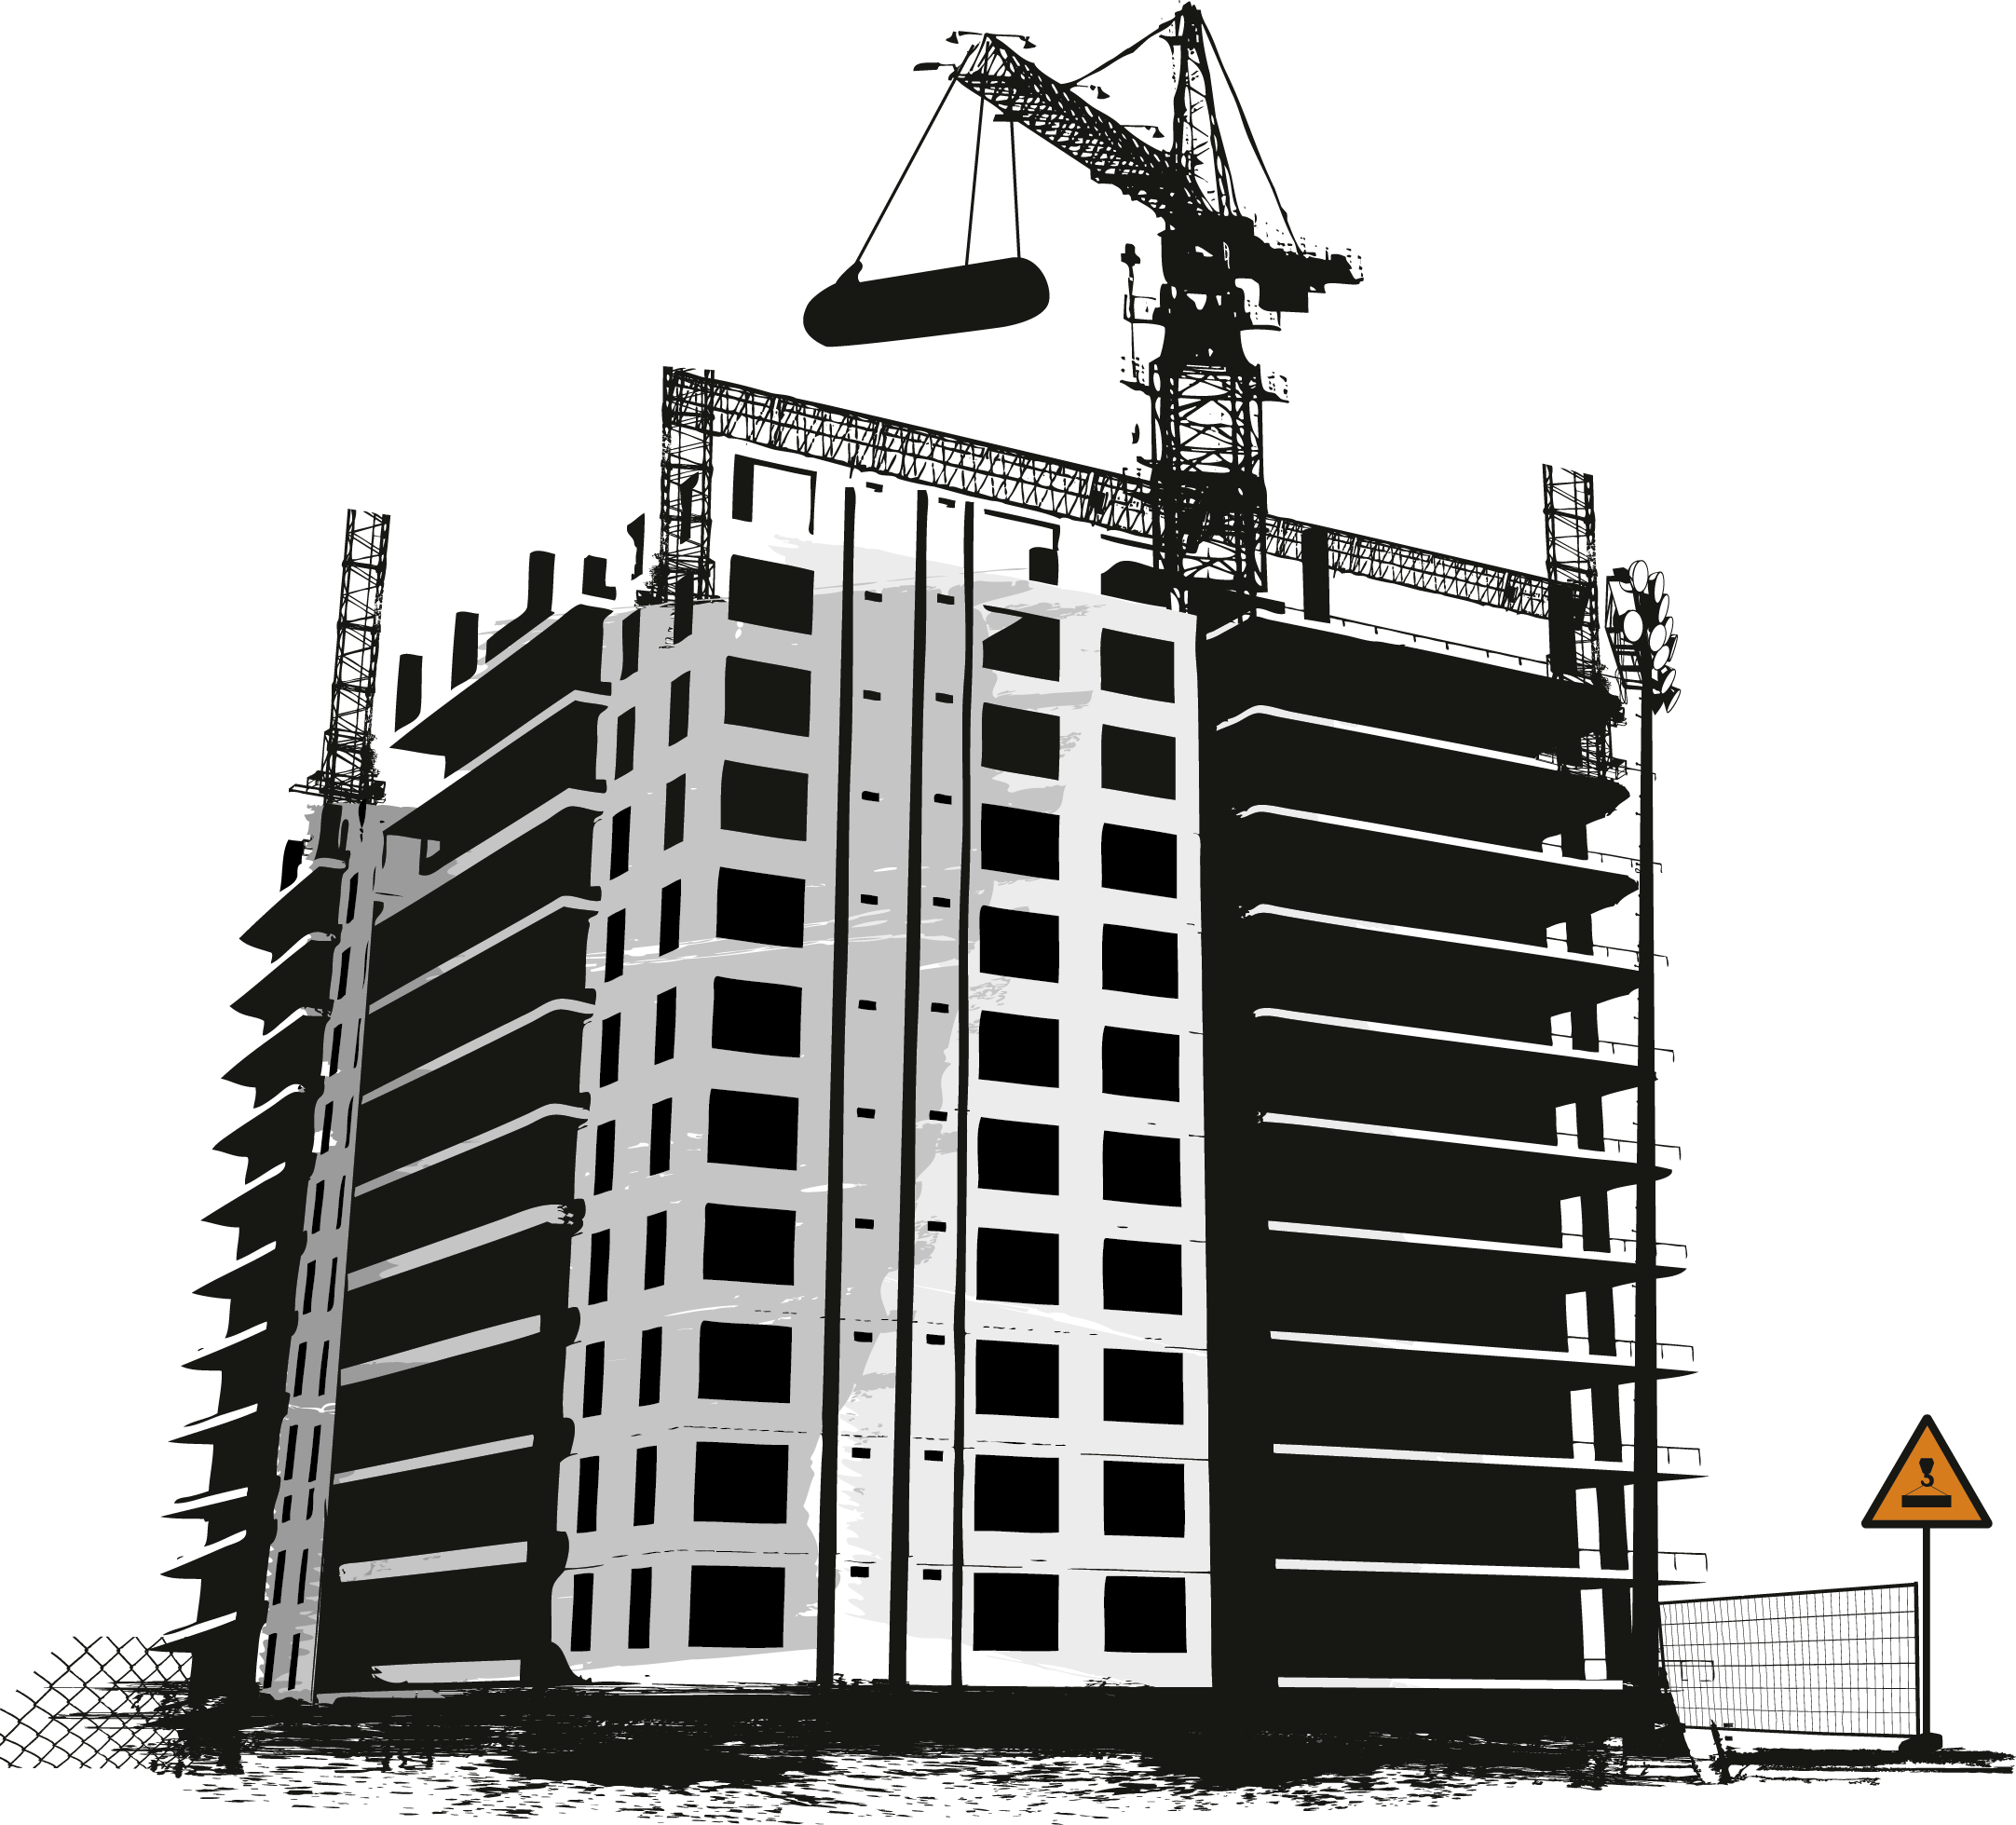 clipart transparent Building Architectural engineering Clip art